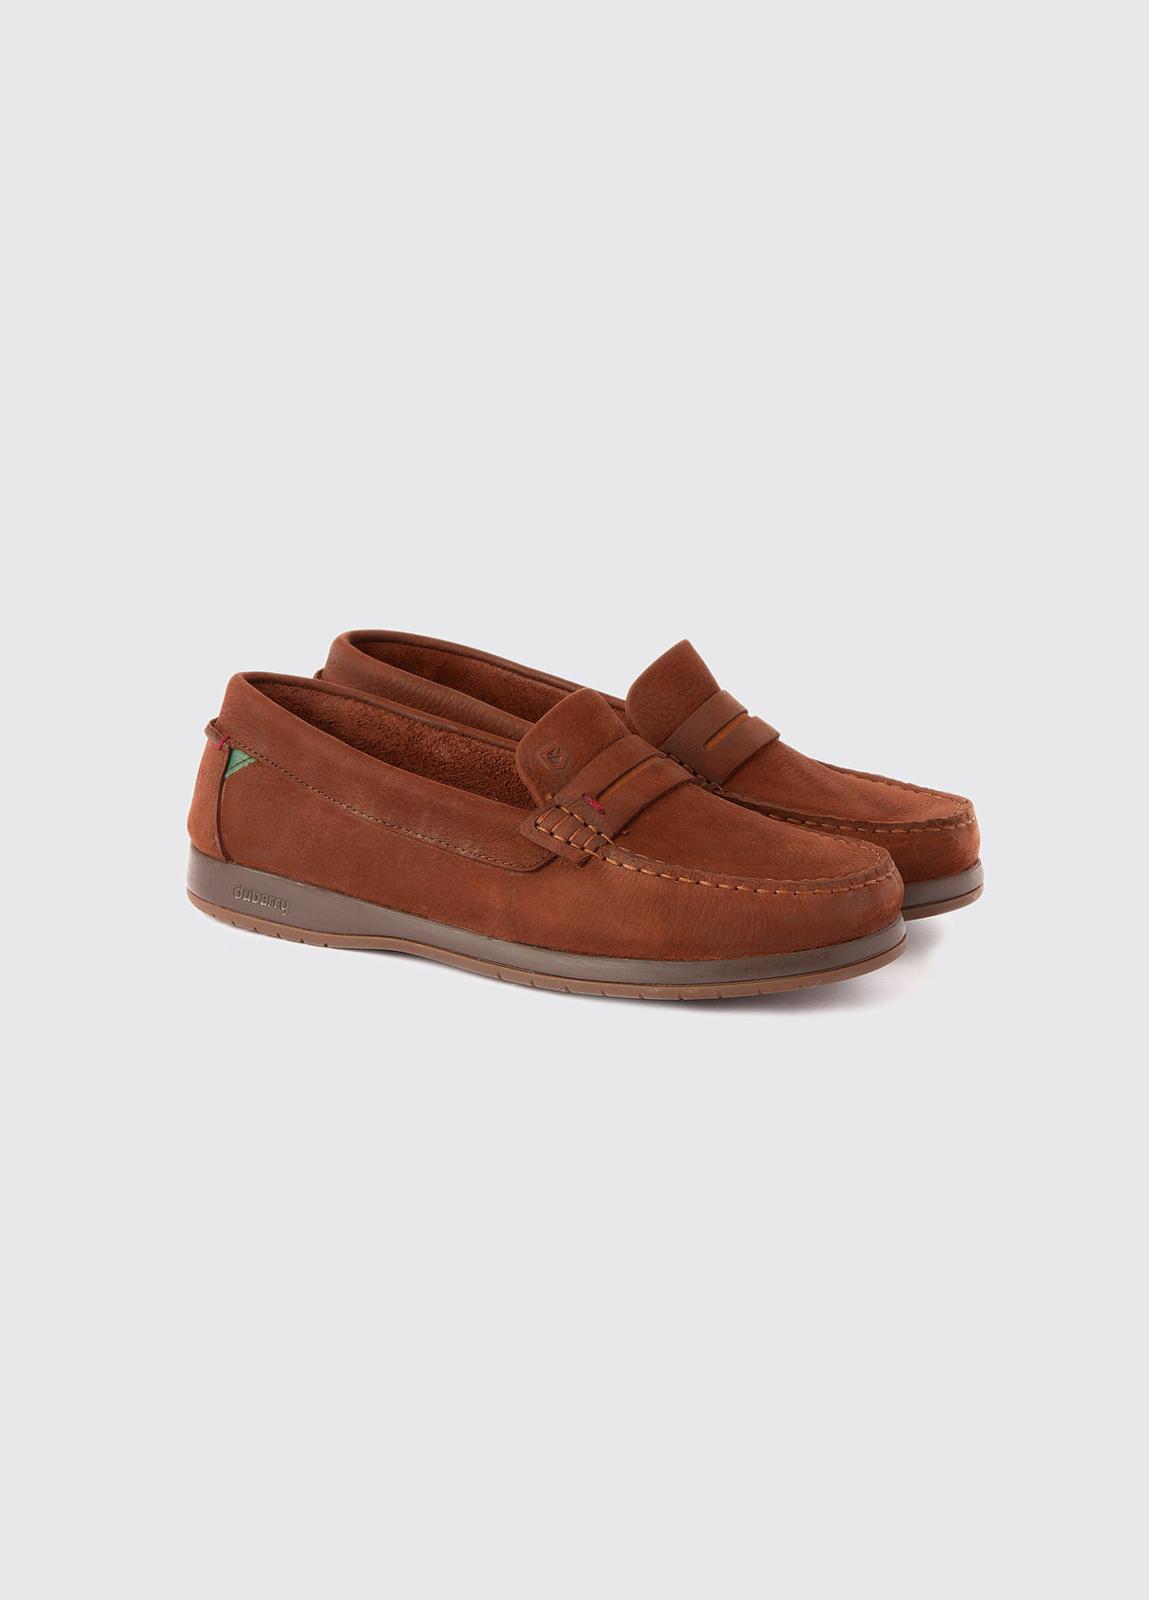 Mizen X LT Deck shoes - Walnut